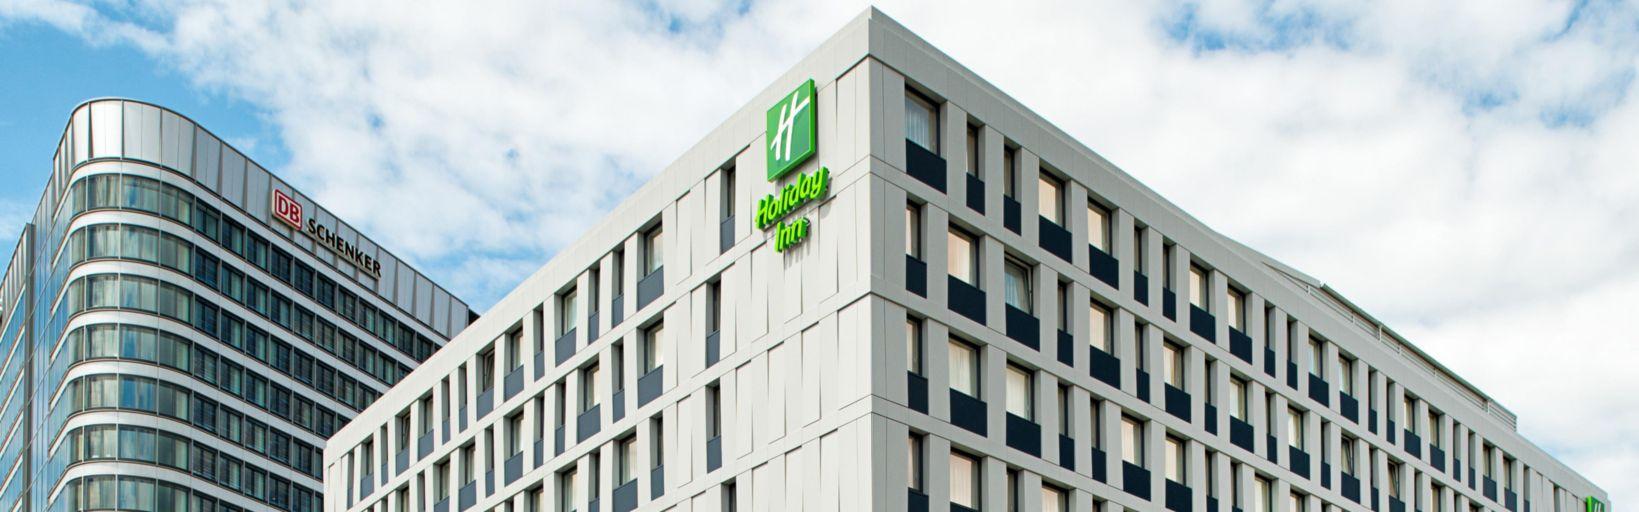 Airport Hotel Holiday Inn Hotel Frankfurt Airport